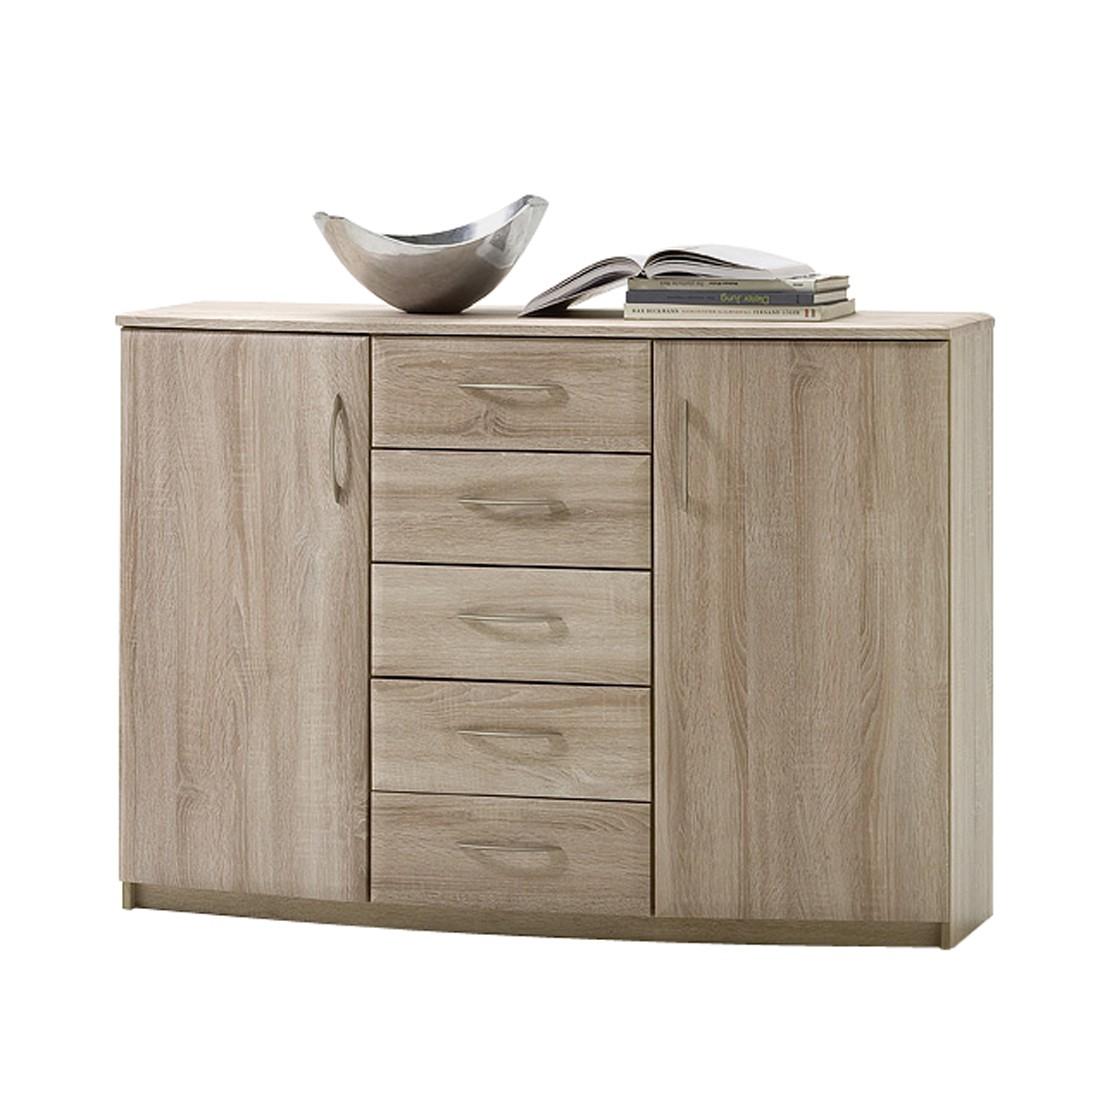 sonoma eiche parkett interessante ideen f r. Black Bedroom Furniture Sets. Home Design Ideas